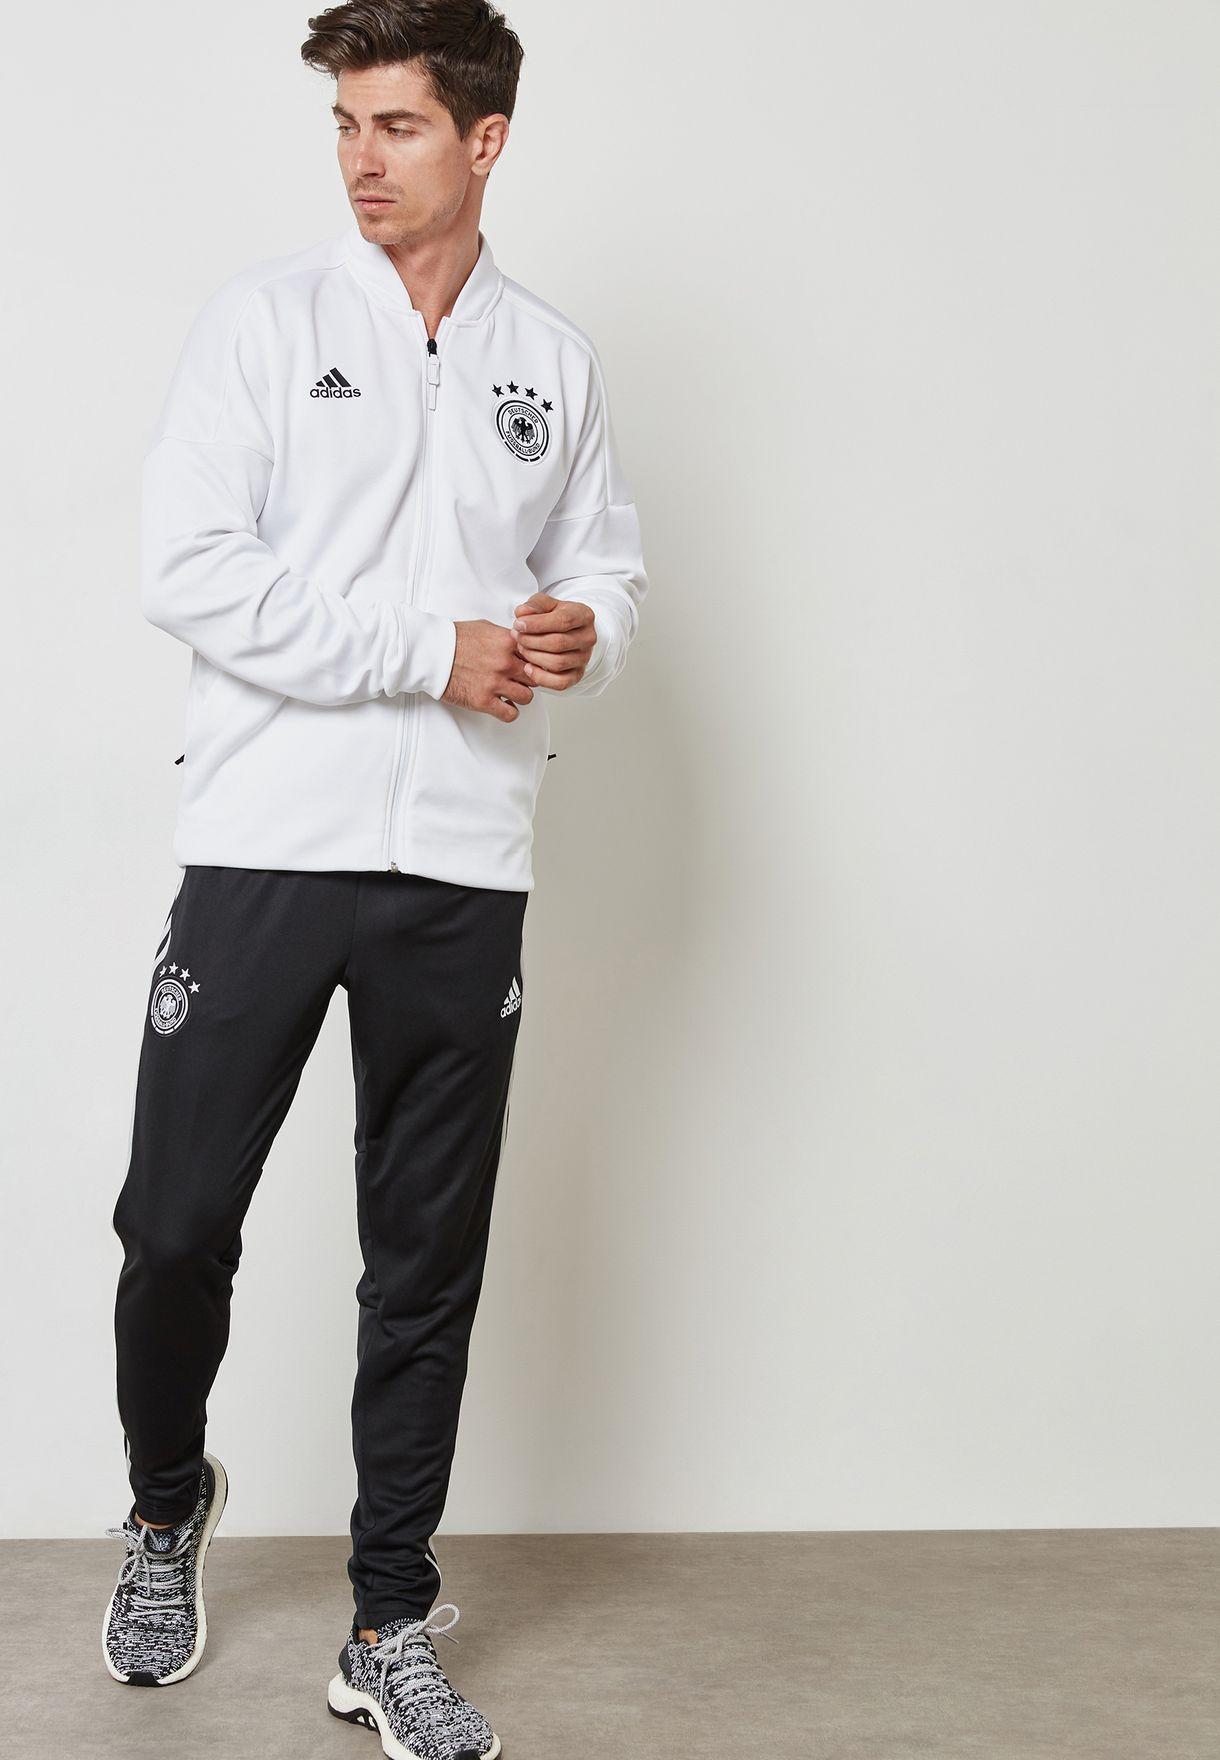 adidas Men's Germany Adidas Z.N.E. Jacket | CD4304